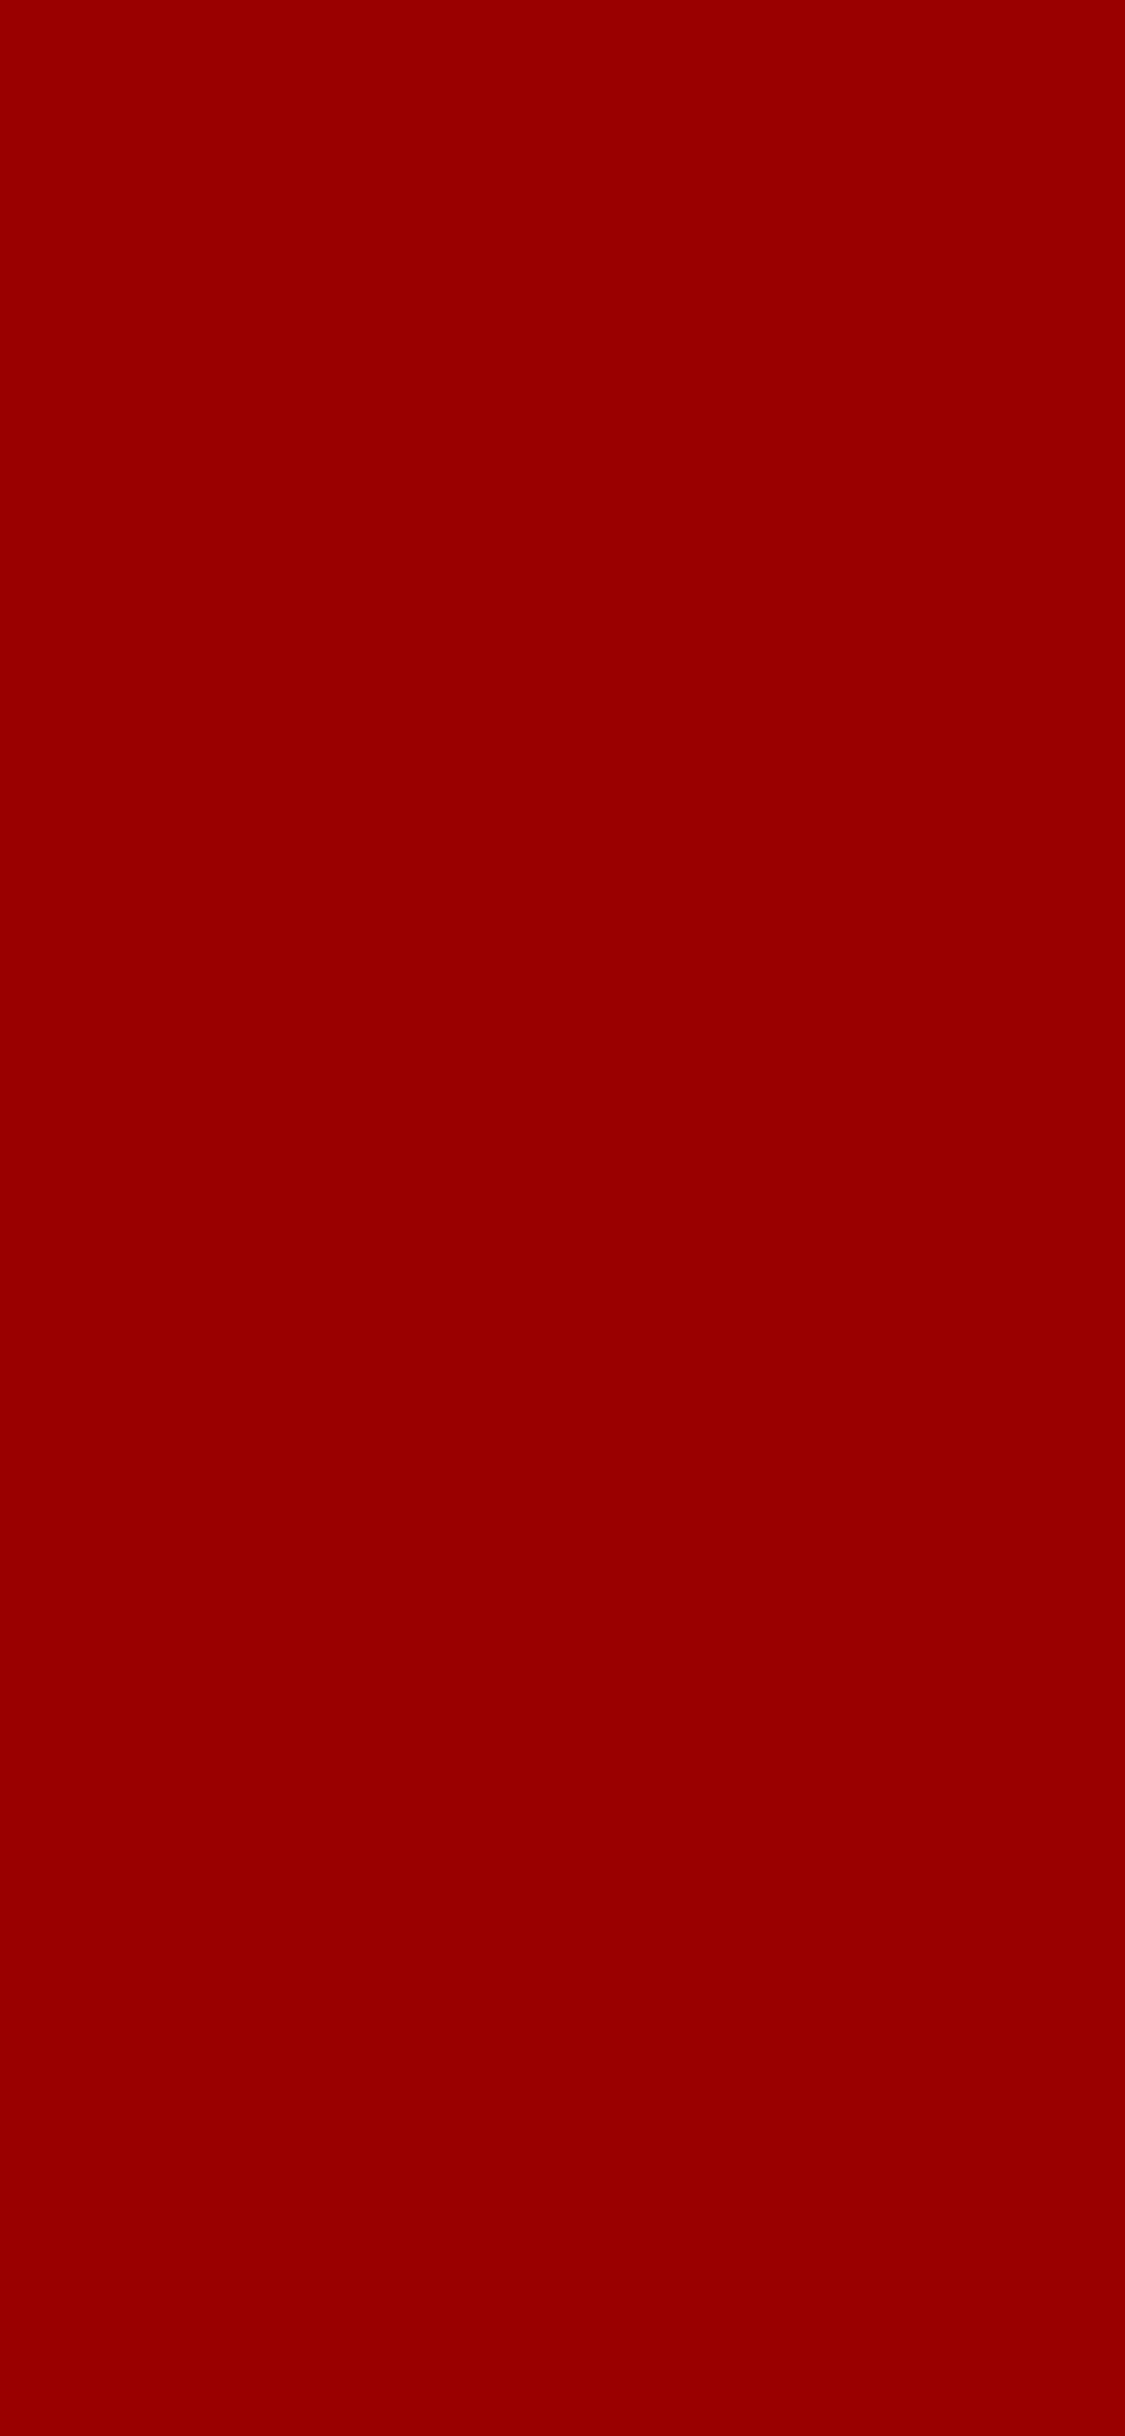 1125x2436 Stizza Solid Color Background